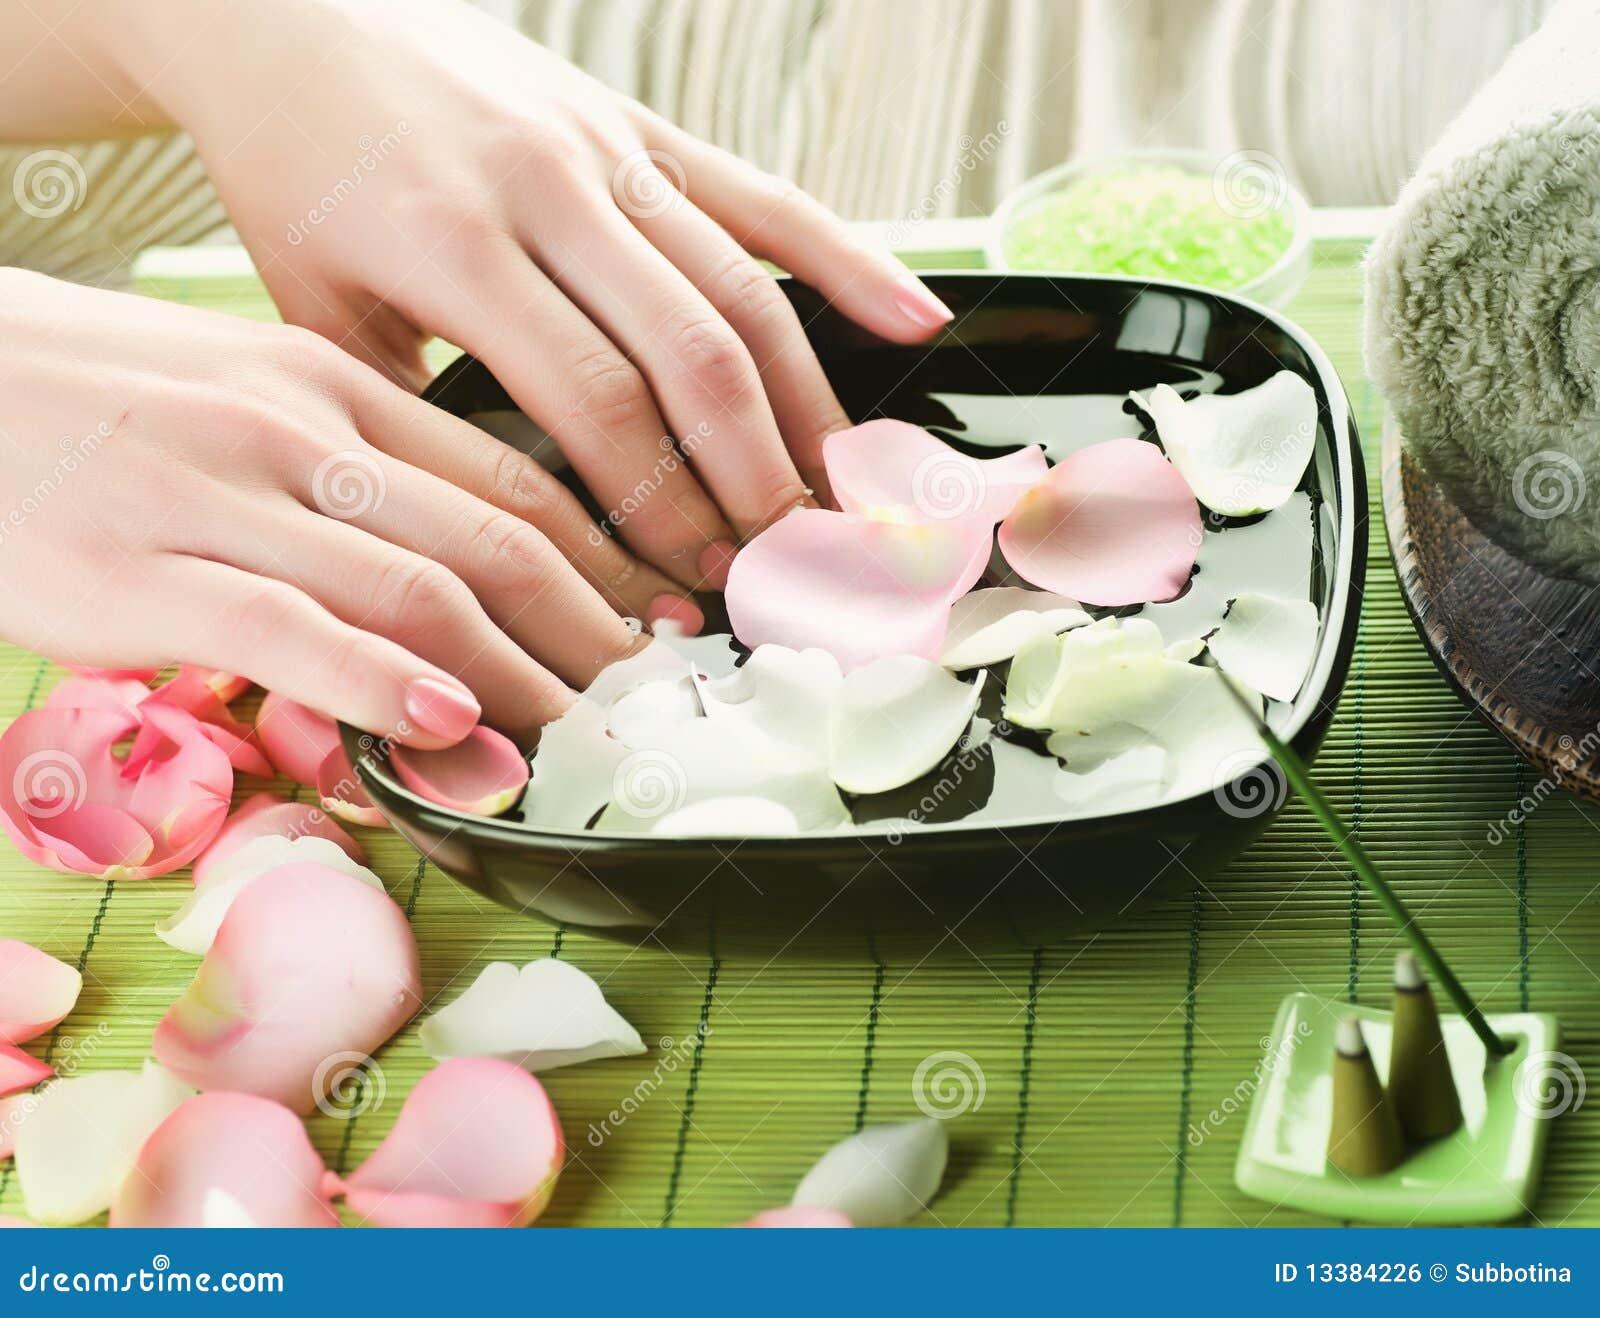 Manicure.Spa Royalty Free Stock Image - Image: 13384226